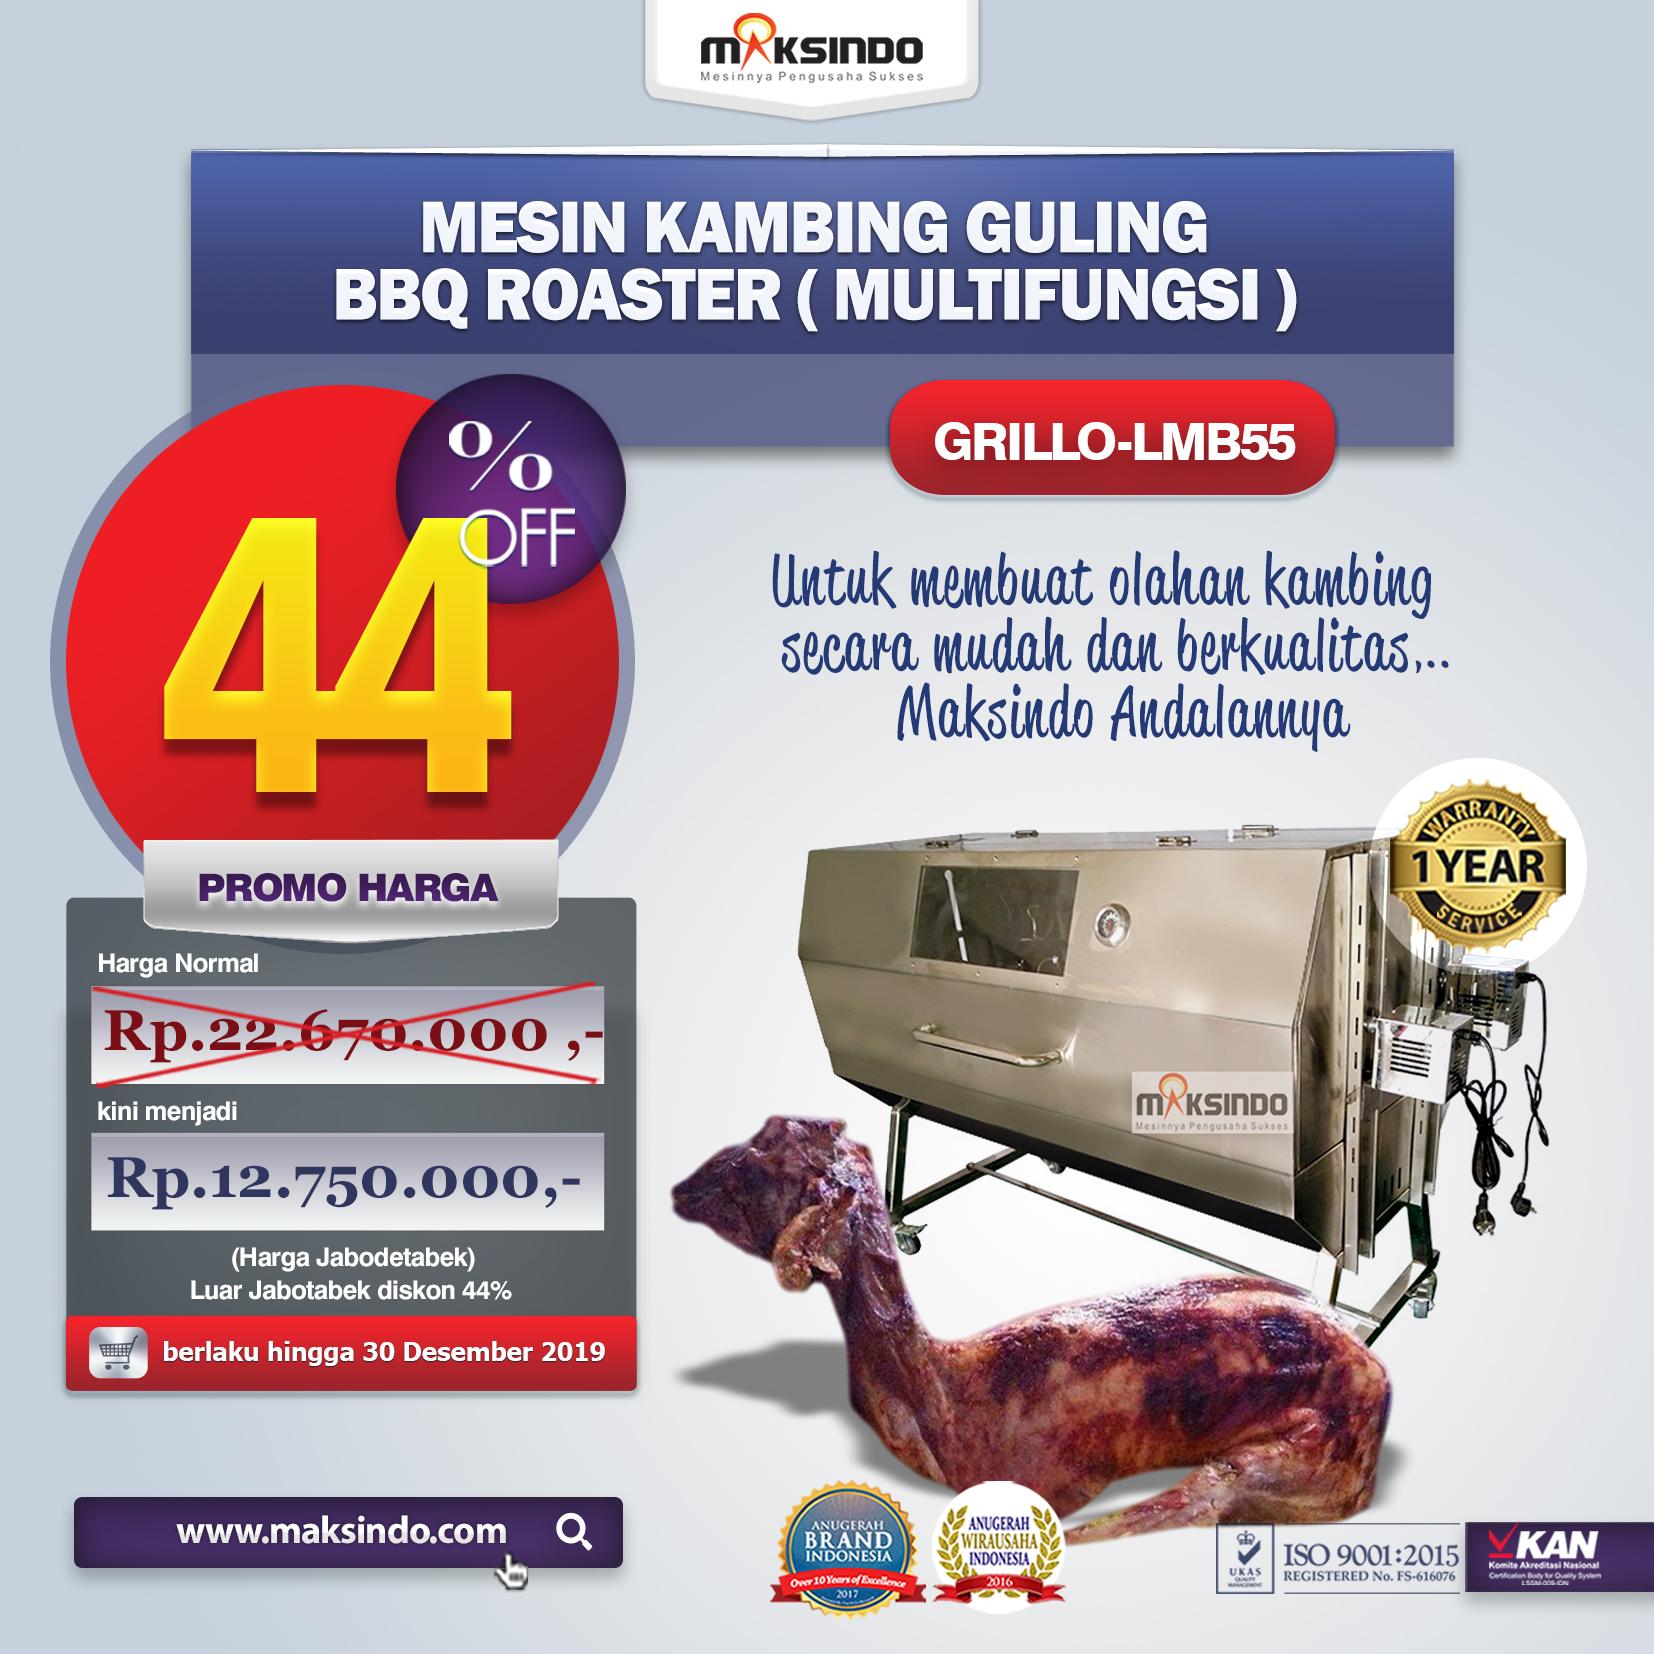 Jual Mesin Kambing Guling Double Location Roaster (GRILLO-LMB55) di Pekanbaru